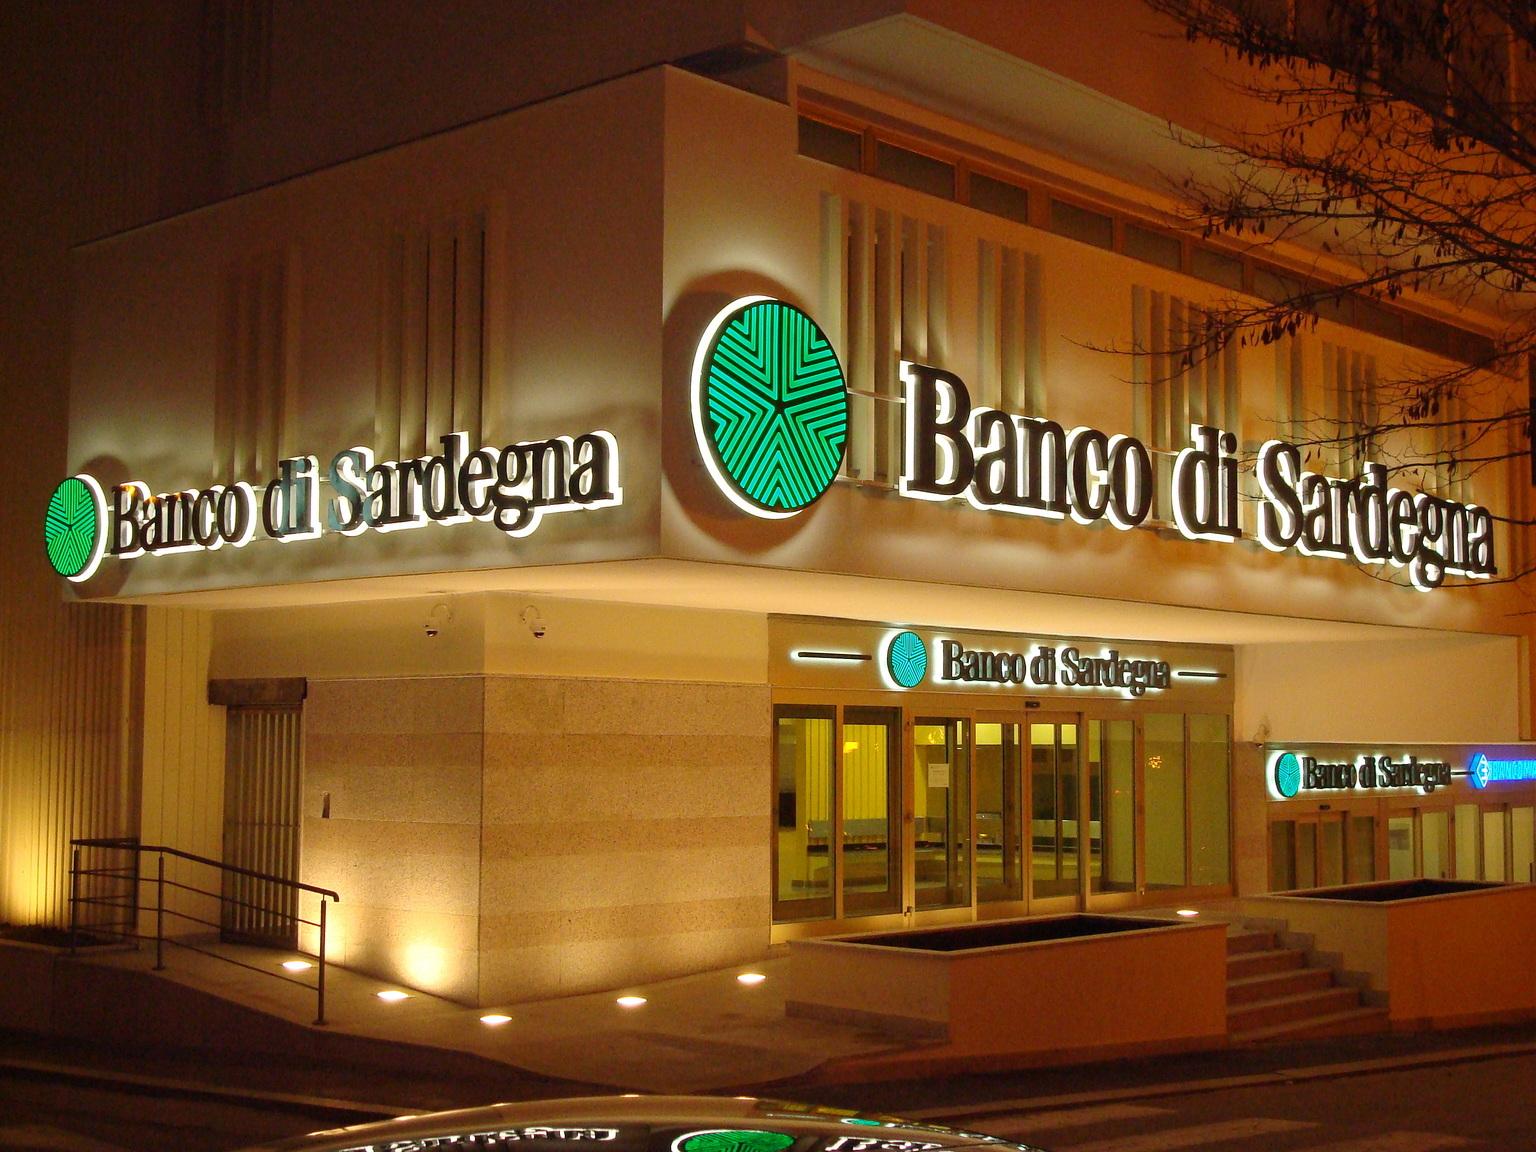 Banco-di-Sardegna-sede-sassari-insegne-gennaio-2008-1.jpg